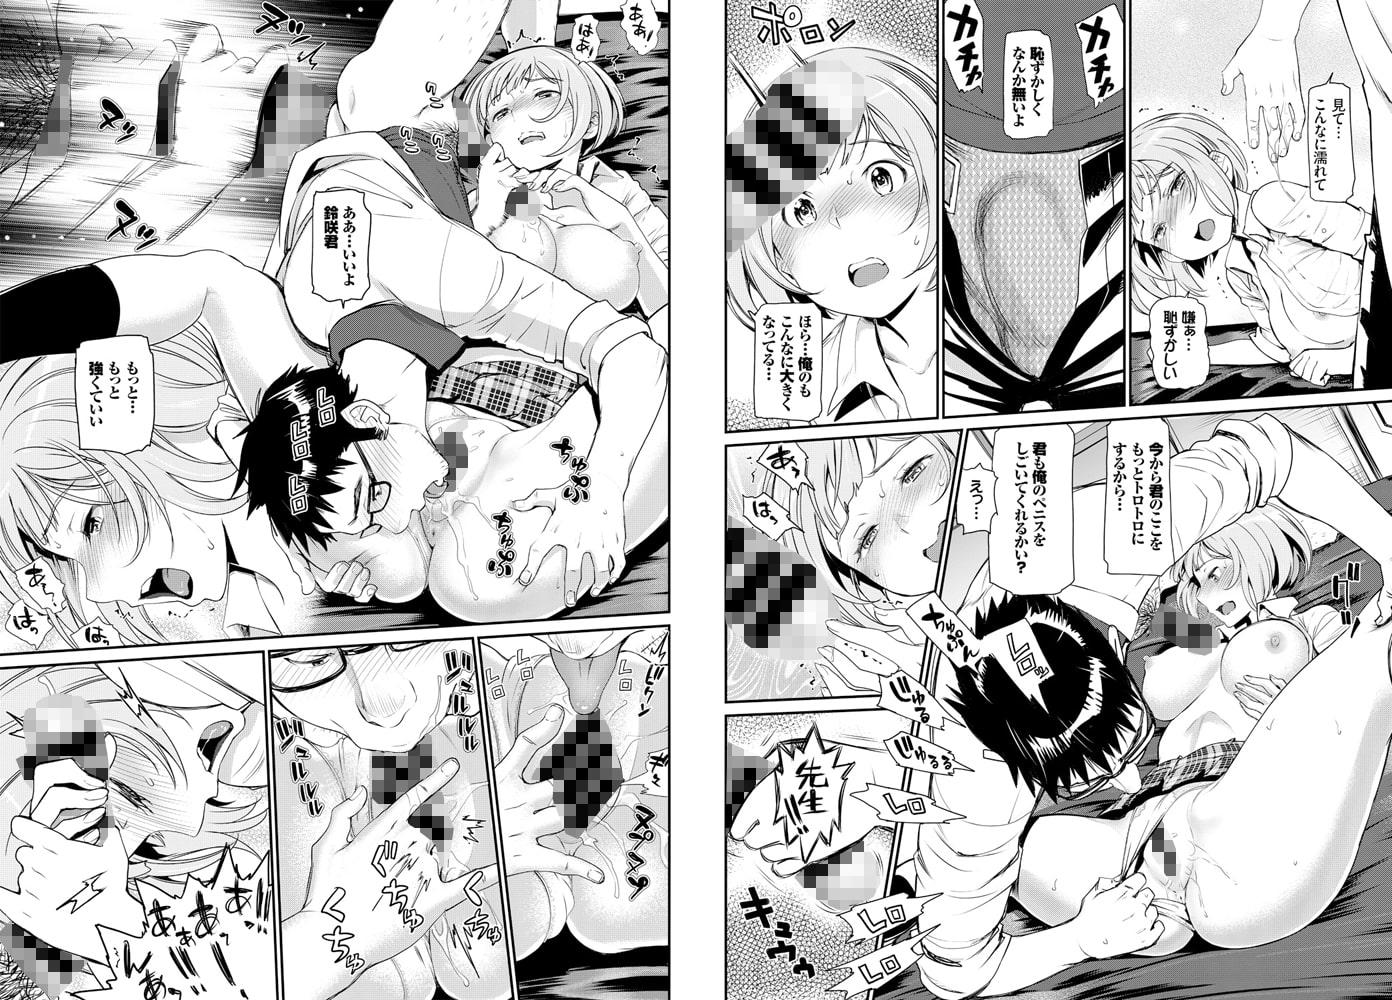 COMIC BAVEL SPECIAL COLLECTION(コミックバベル スペシャルコレクション) VOL13